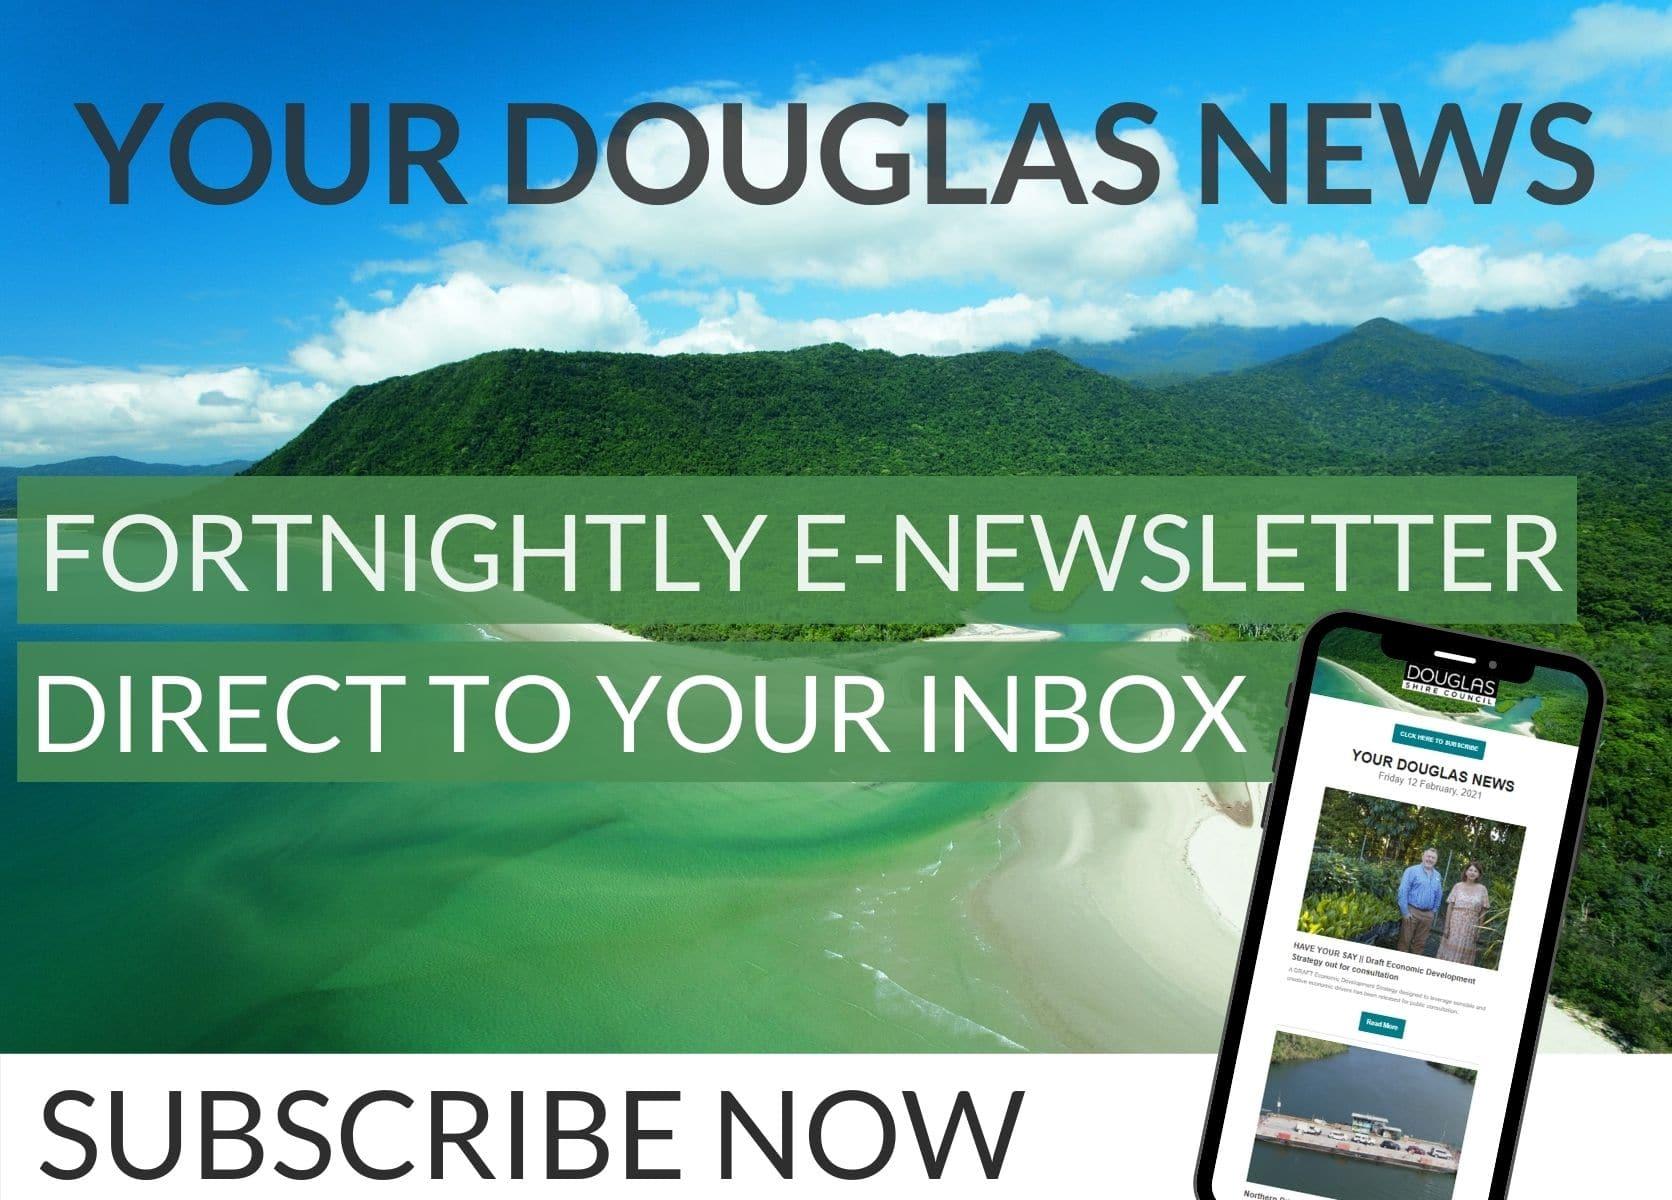 HOME PAGE - Your Douglas News